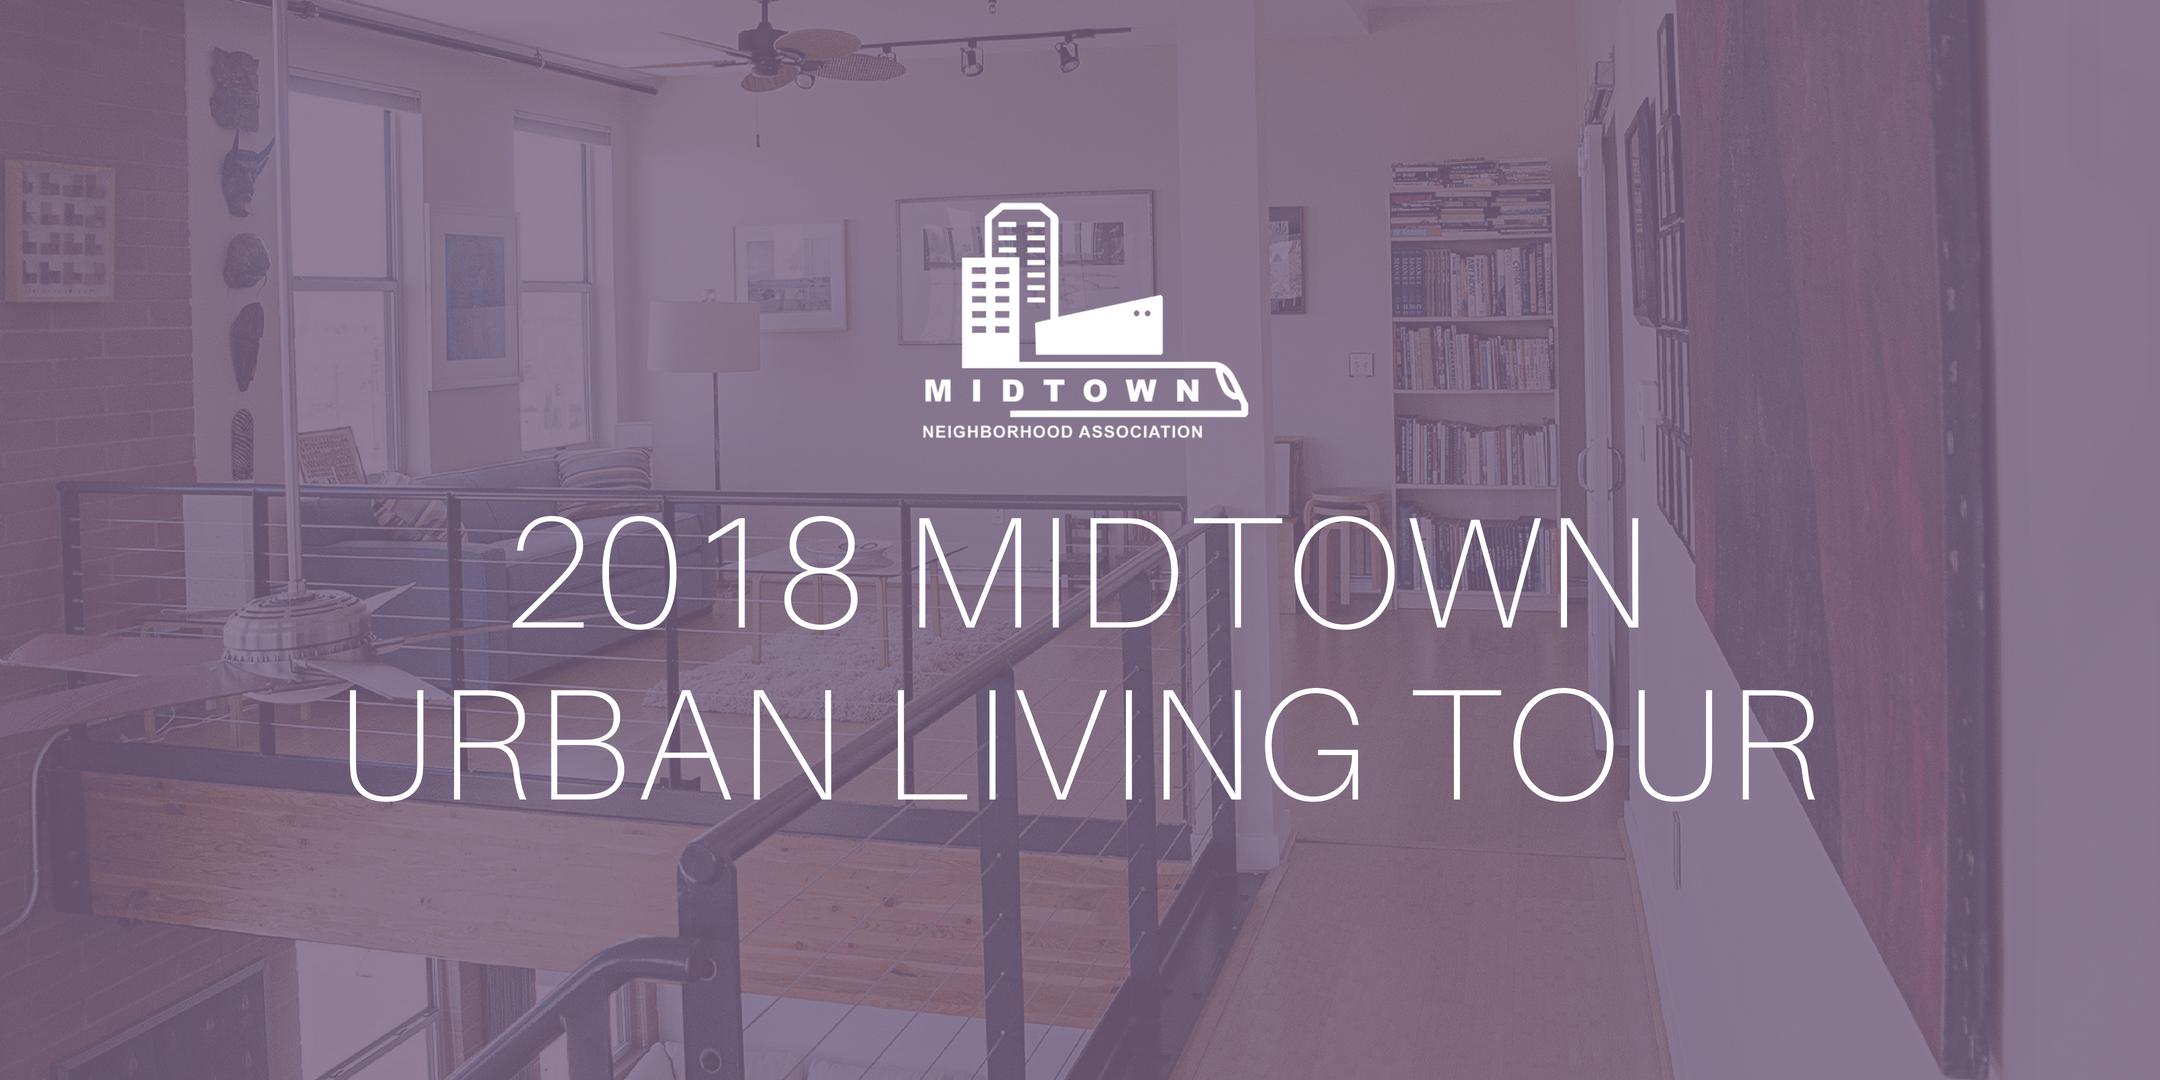 2018 Midtown Urban Living Tour